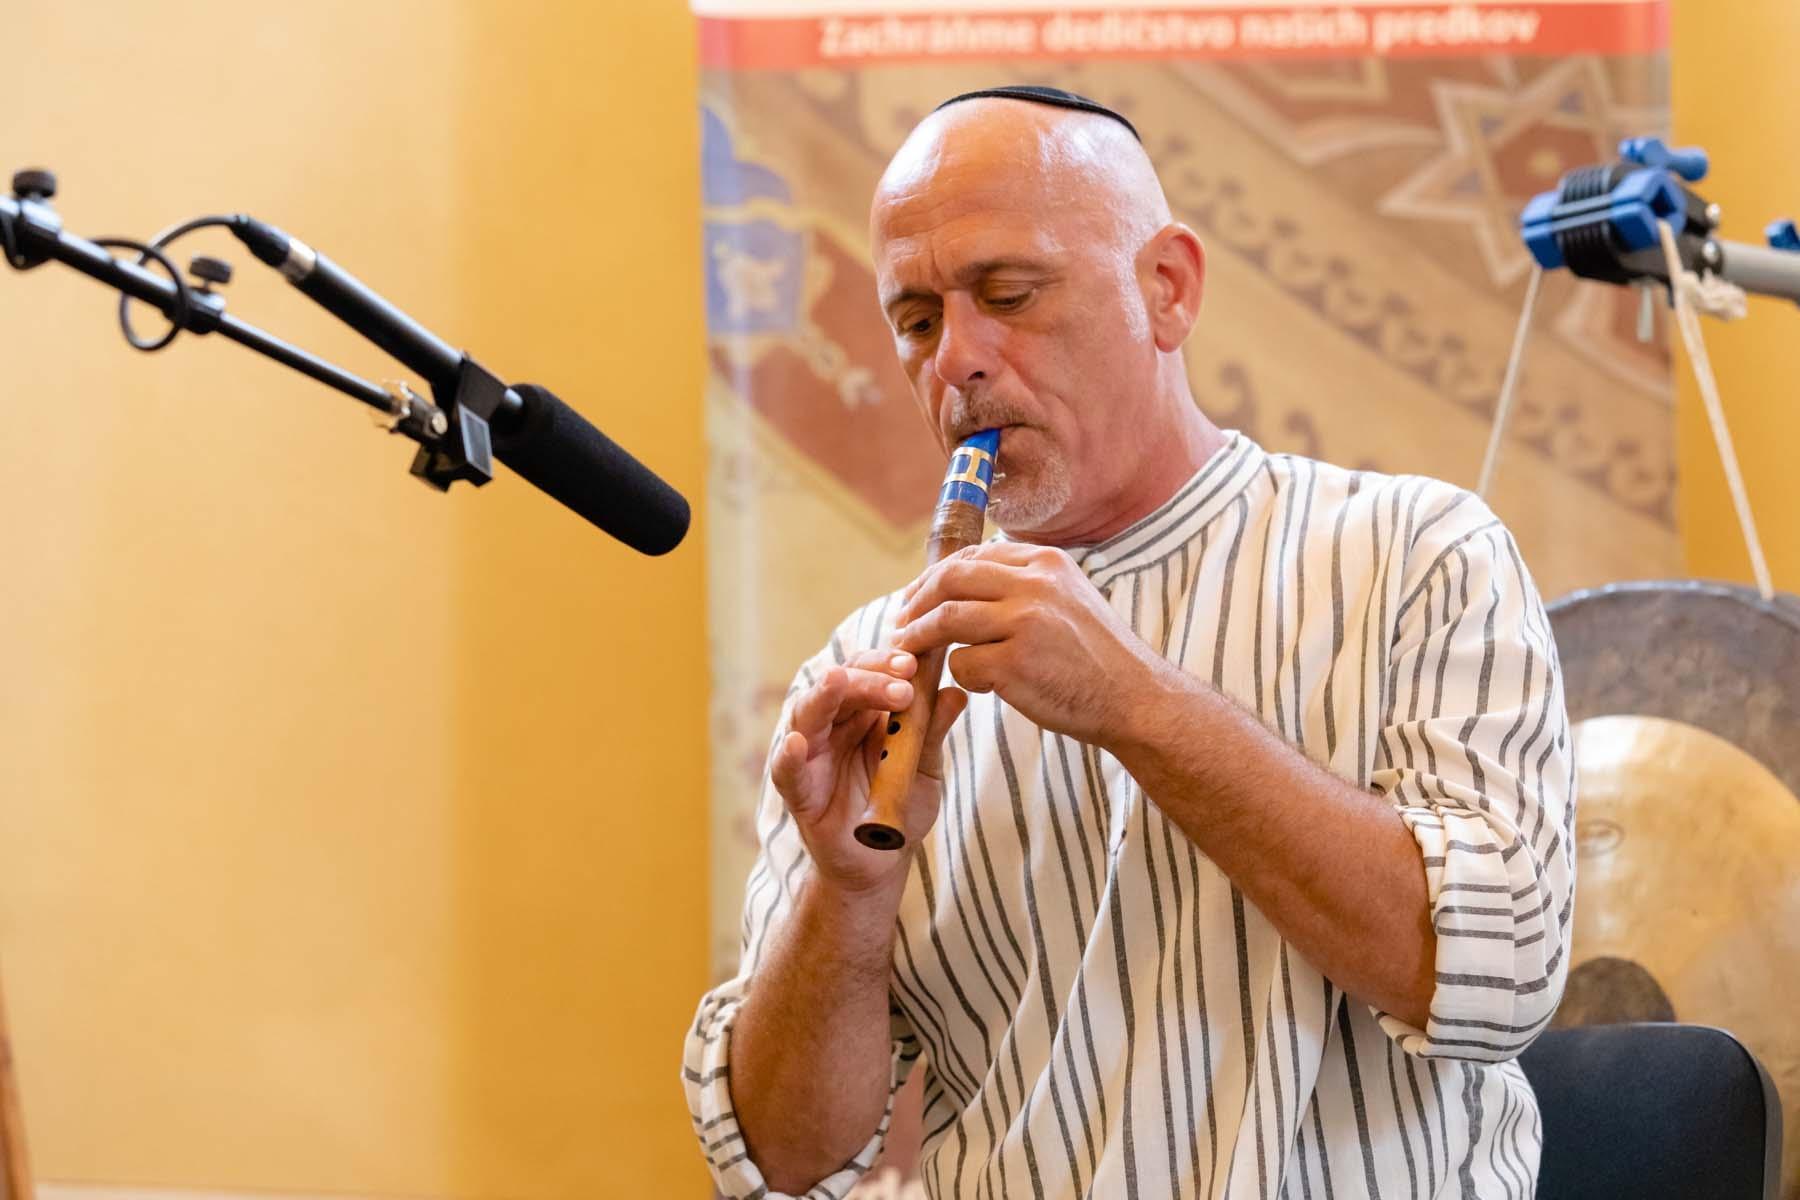 Special concert performed by Slovak multi-instrumentalist Michal Smetanka